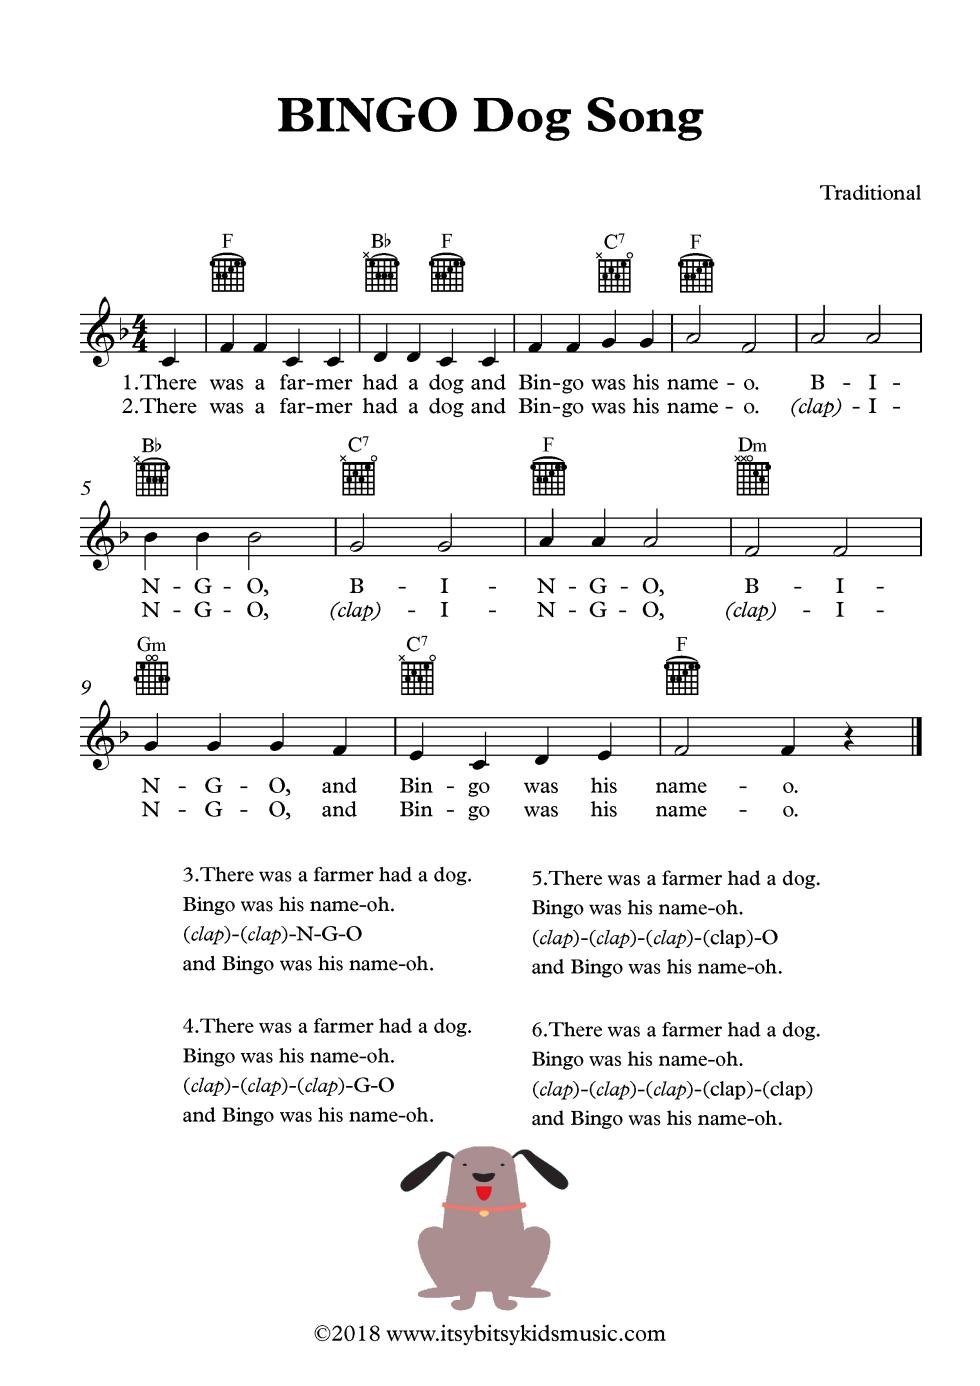 BINGO Dog Song Sheet Music With Chords And Lyrics